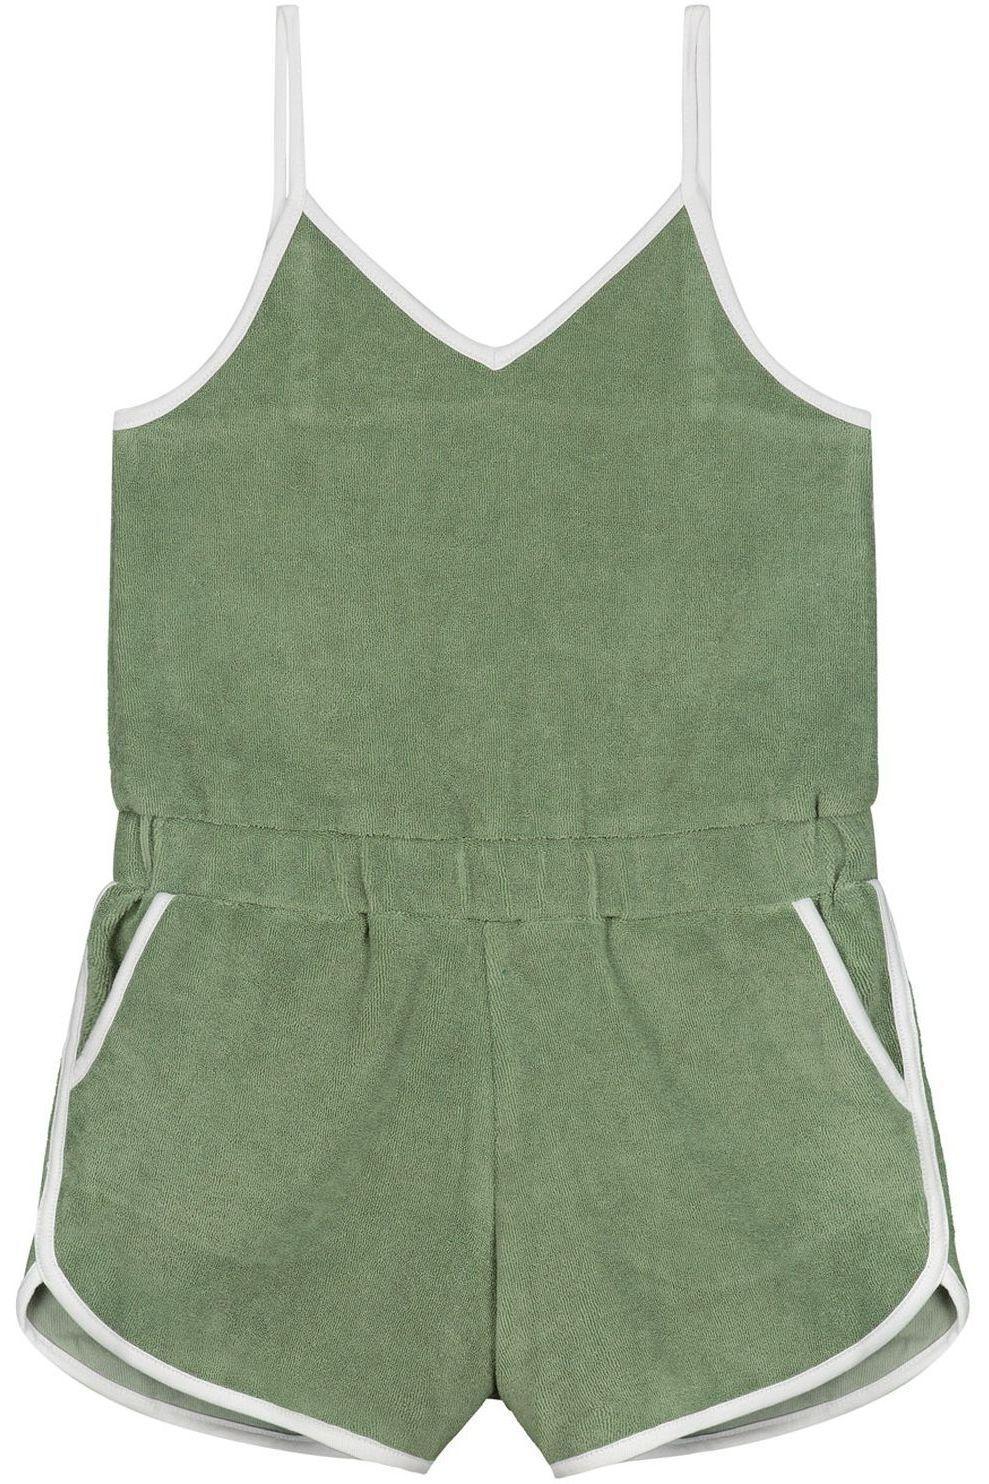 Shiwi Jumpsuit Girls Braga voor meisjes - LichtGroen - Maten: 128, 140, 152, 164